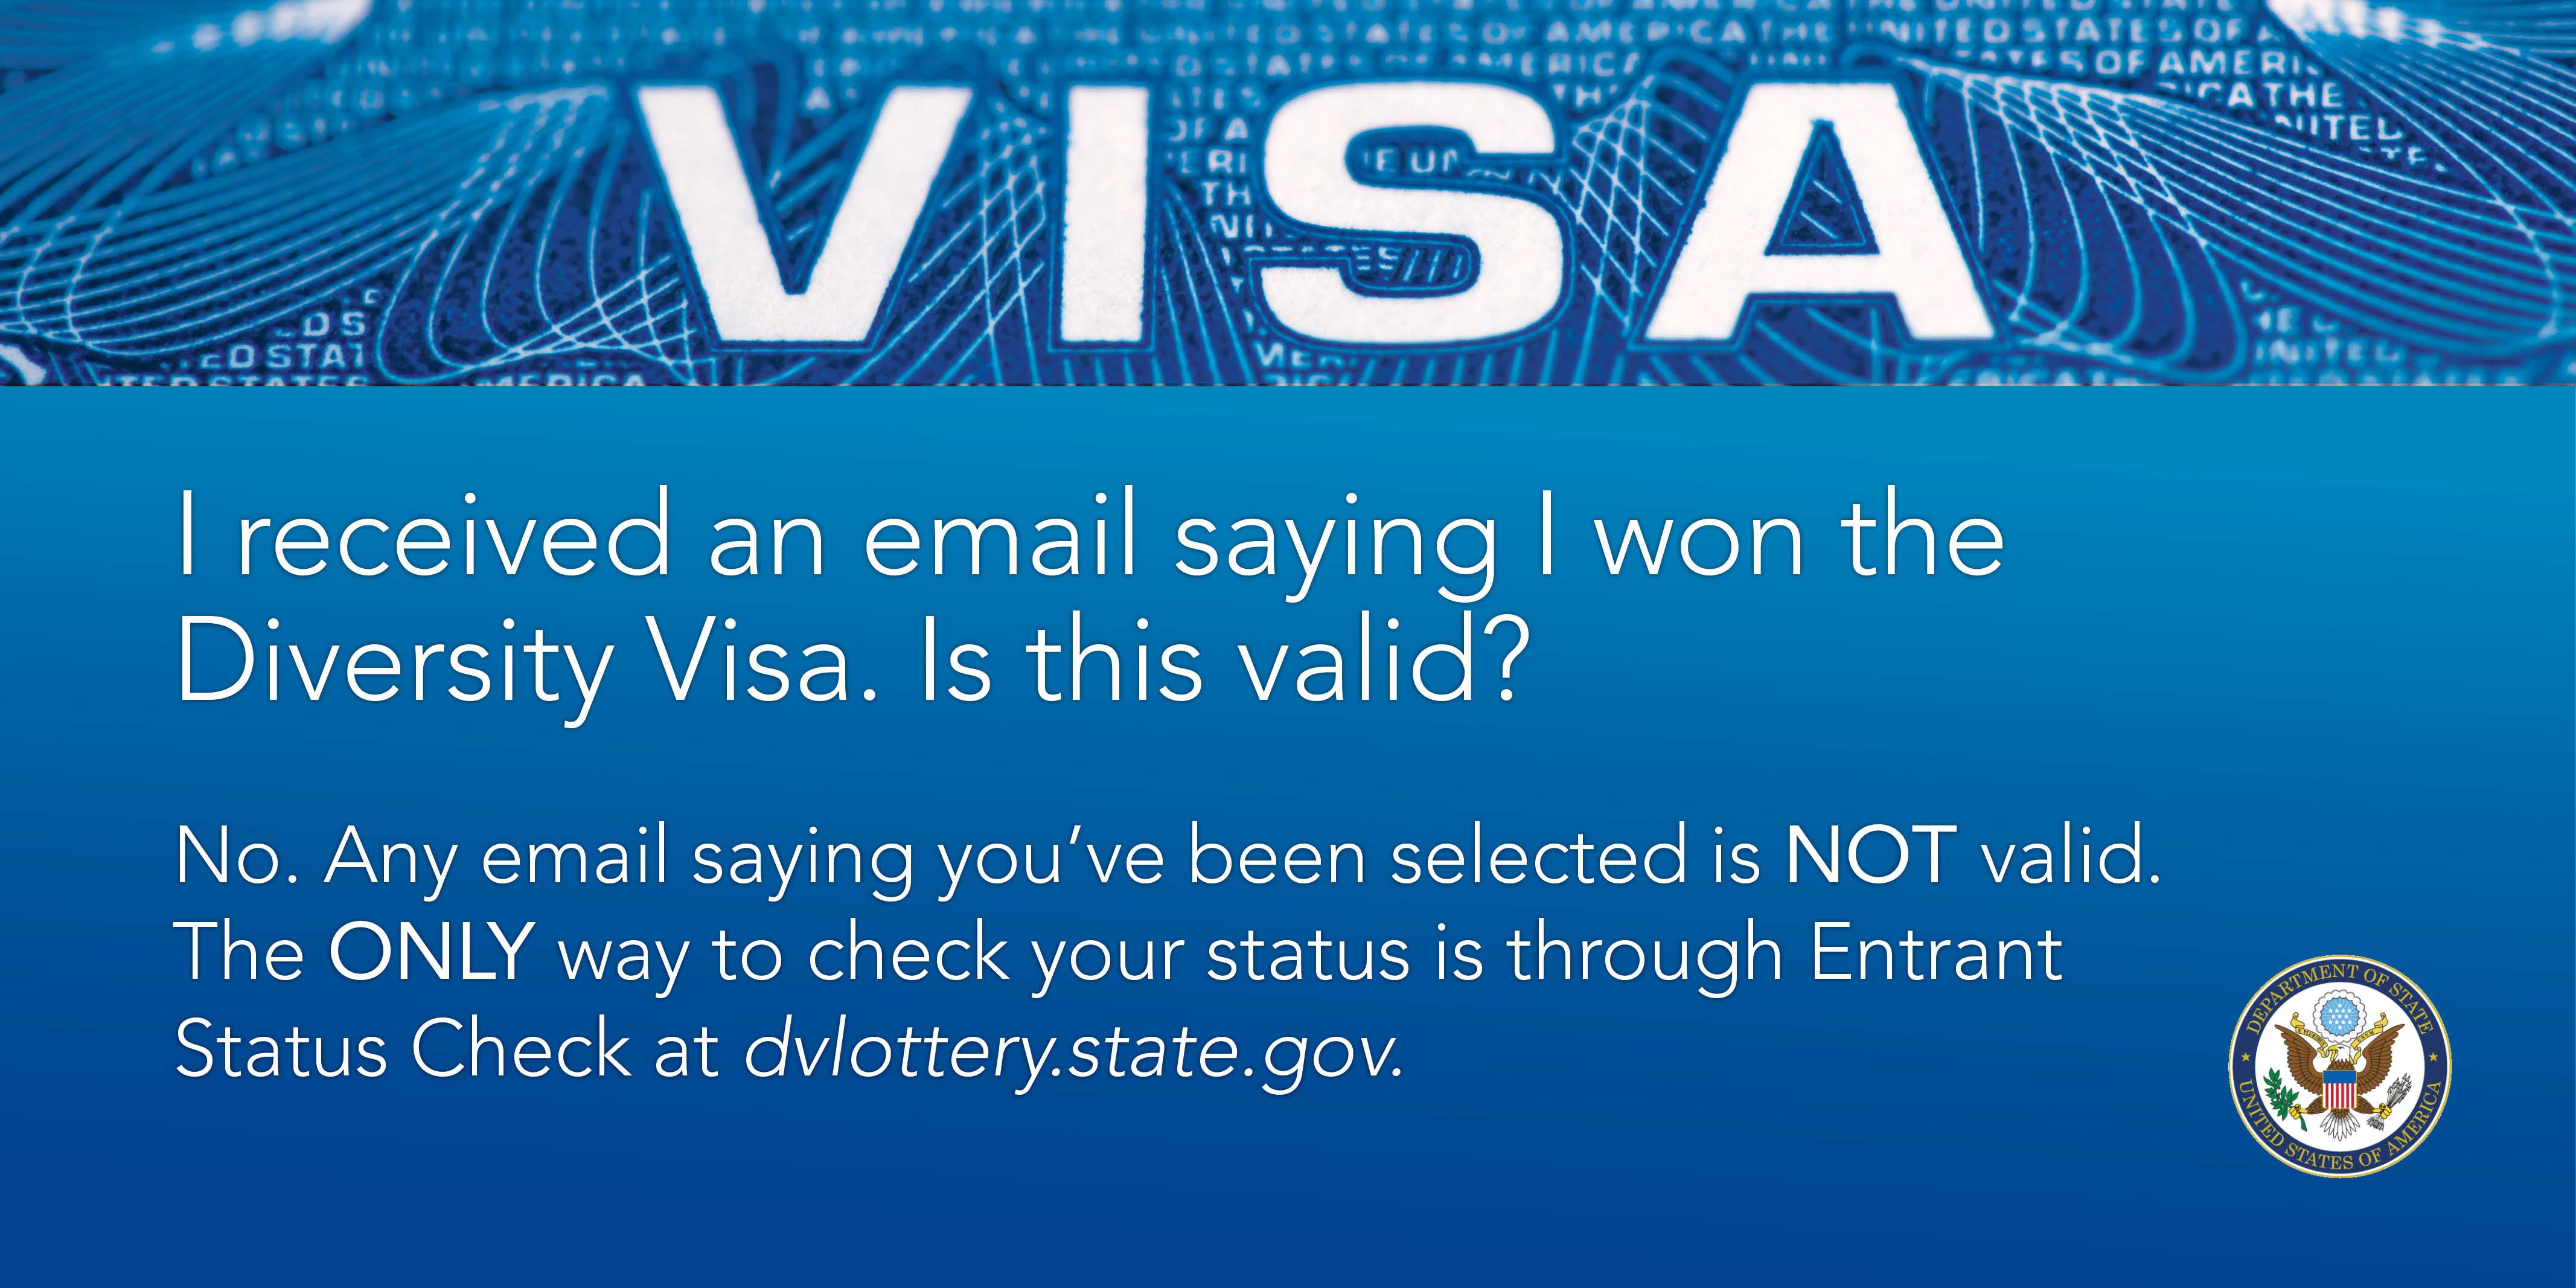 Online Registration For The 2021 Diversity Visa Program U S Embassy In Tajikistan